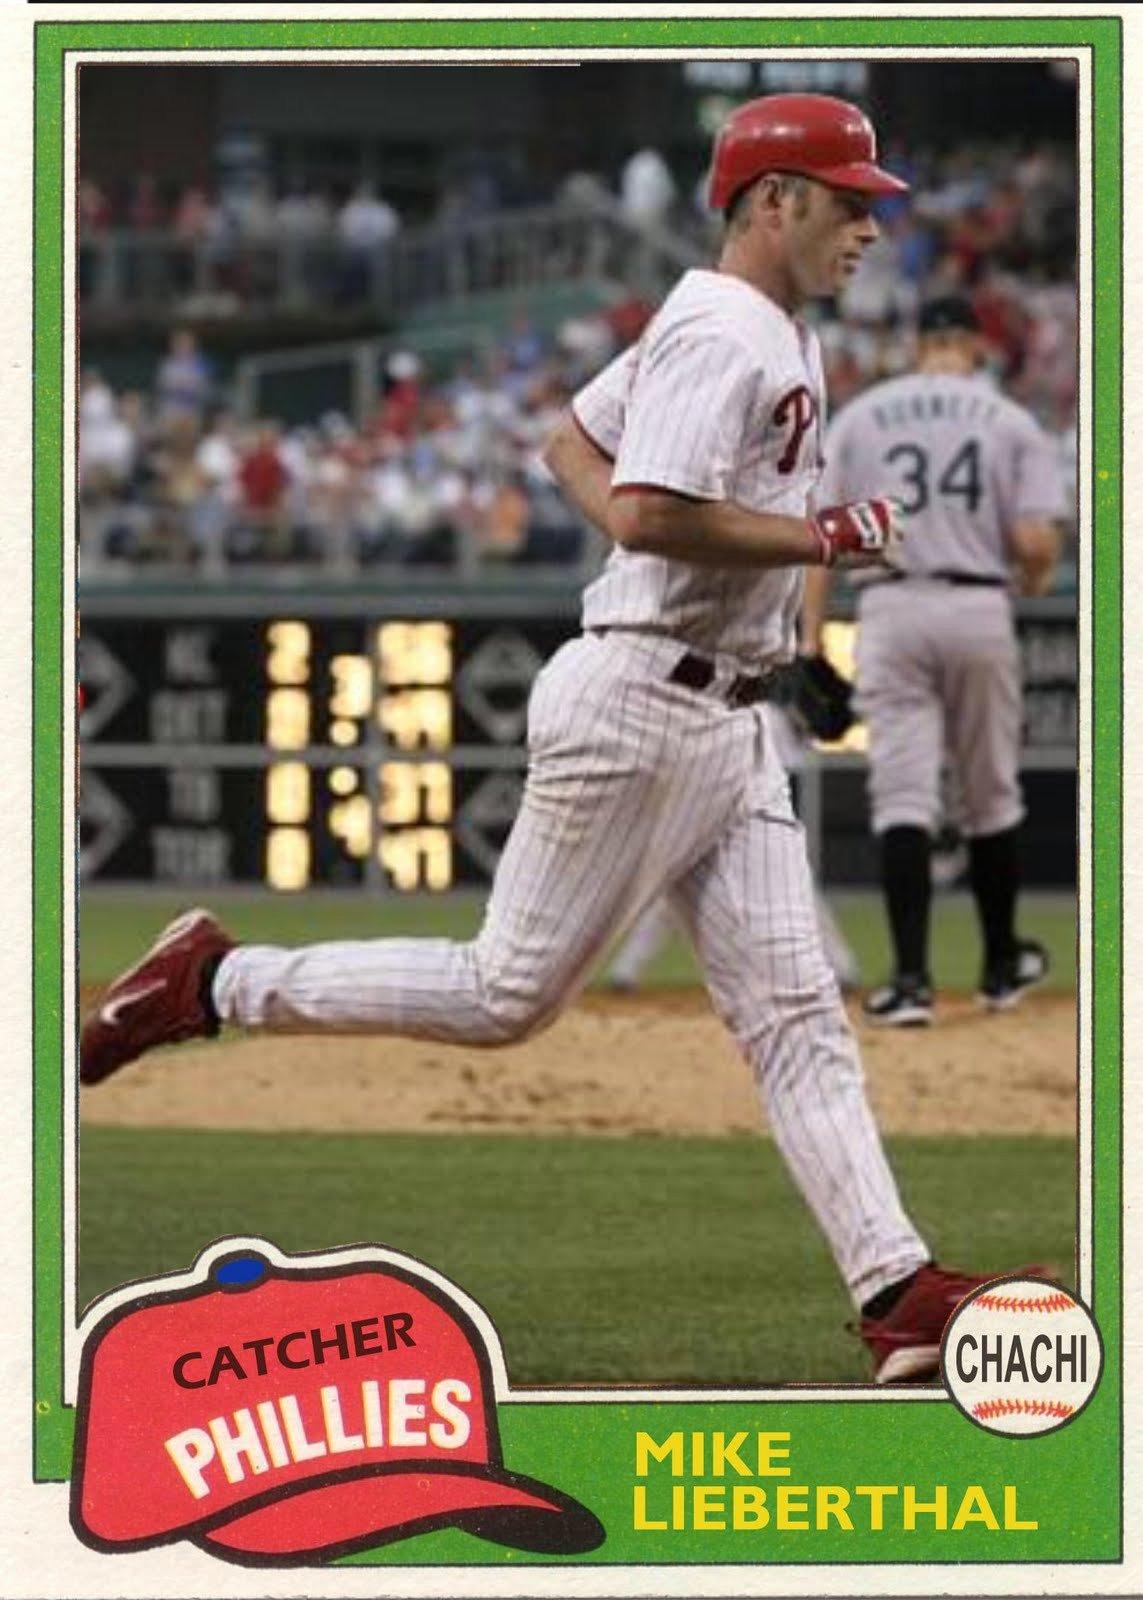 Topps Baseball Card Template Elegant the Phillies Room How to Make A Baseball Card